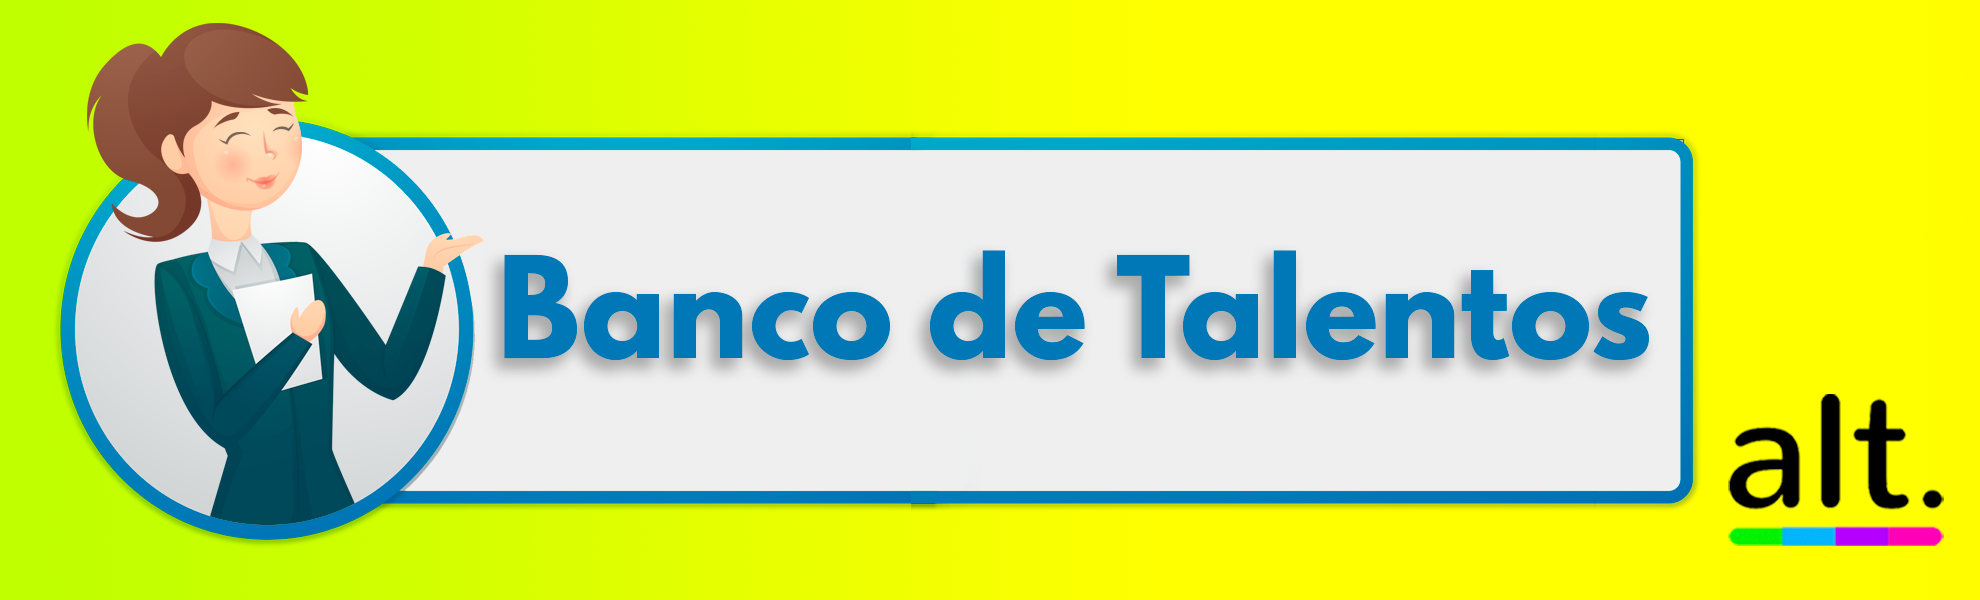 Banco de Talentos - Impactados pelo COVID-19